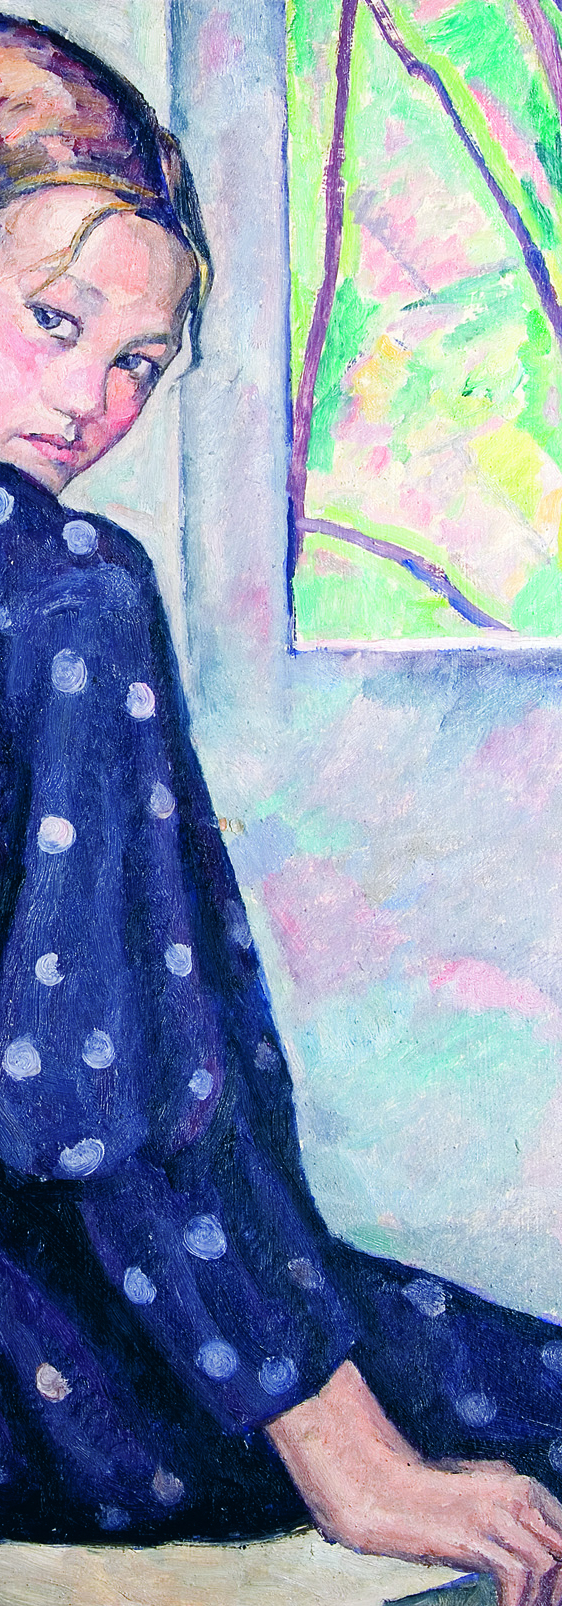 camil ressu - portret de fetita